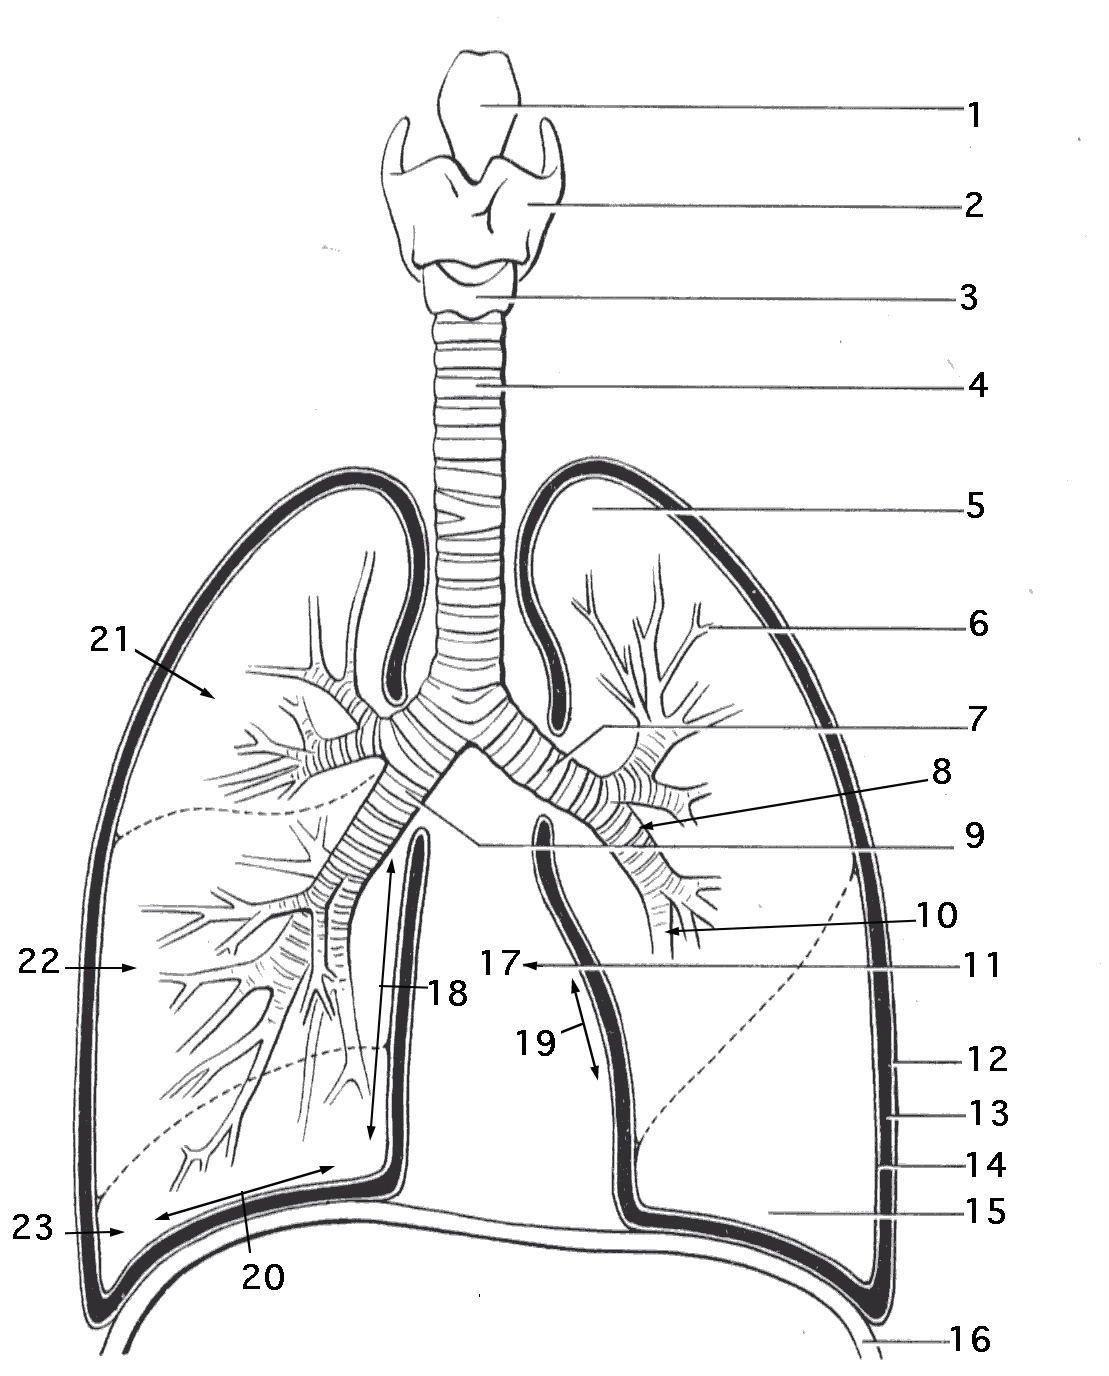 Respiratory System Labelling Worksheet Image Result for ...